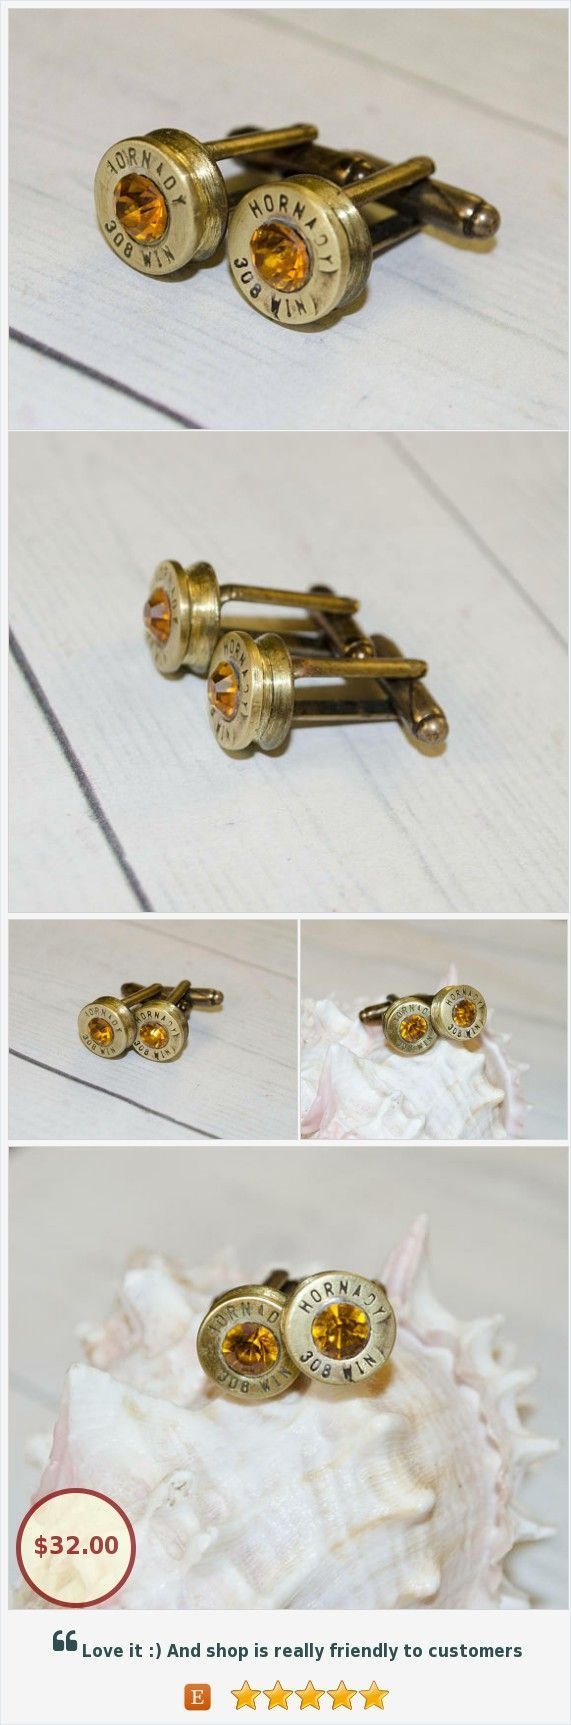 Bullet cufflinks Bullet Jewelry Statement Jewelry Steampunk jewelry Victorian bullet Wedding CuffLinks gift for men Groomsmen Gifts https://www.etsy.com/SteampunkStudioTK/listing/576832867/bullet-cufflinks-bullet-jewelry?ref=shop_home_active_6  (Pinned using https://PromotePictures.com) #men'sjewelry